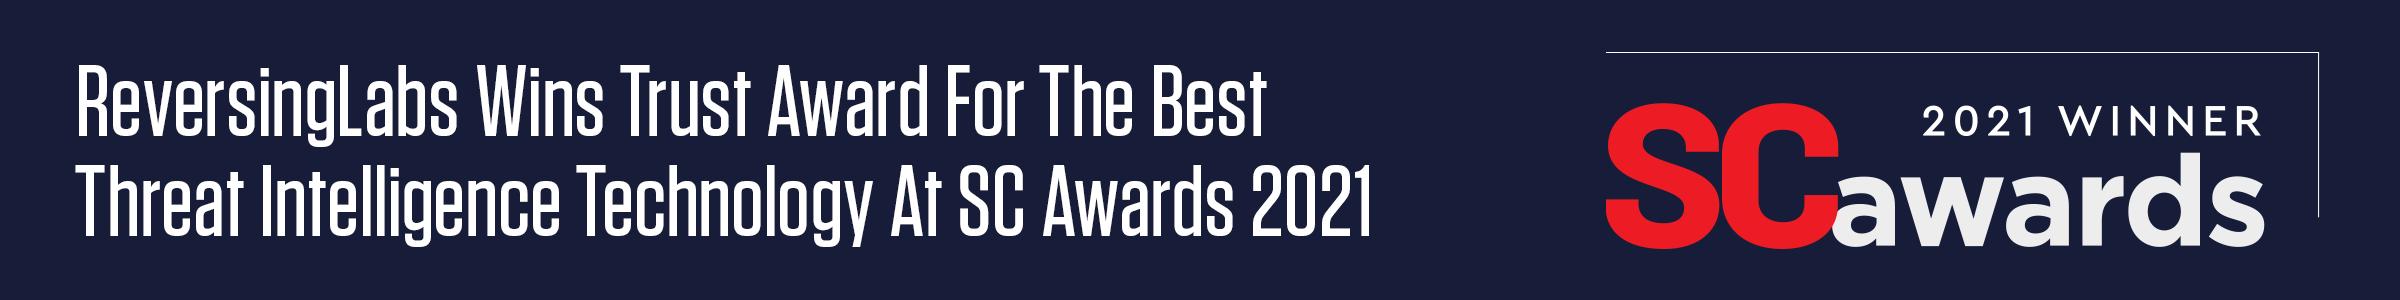 ReversingLabs Wins Trust Award For The Best Threat Intelligence Technology At SC Awards 2021